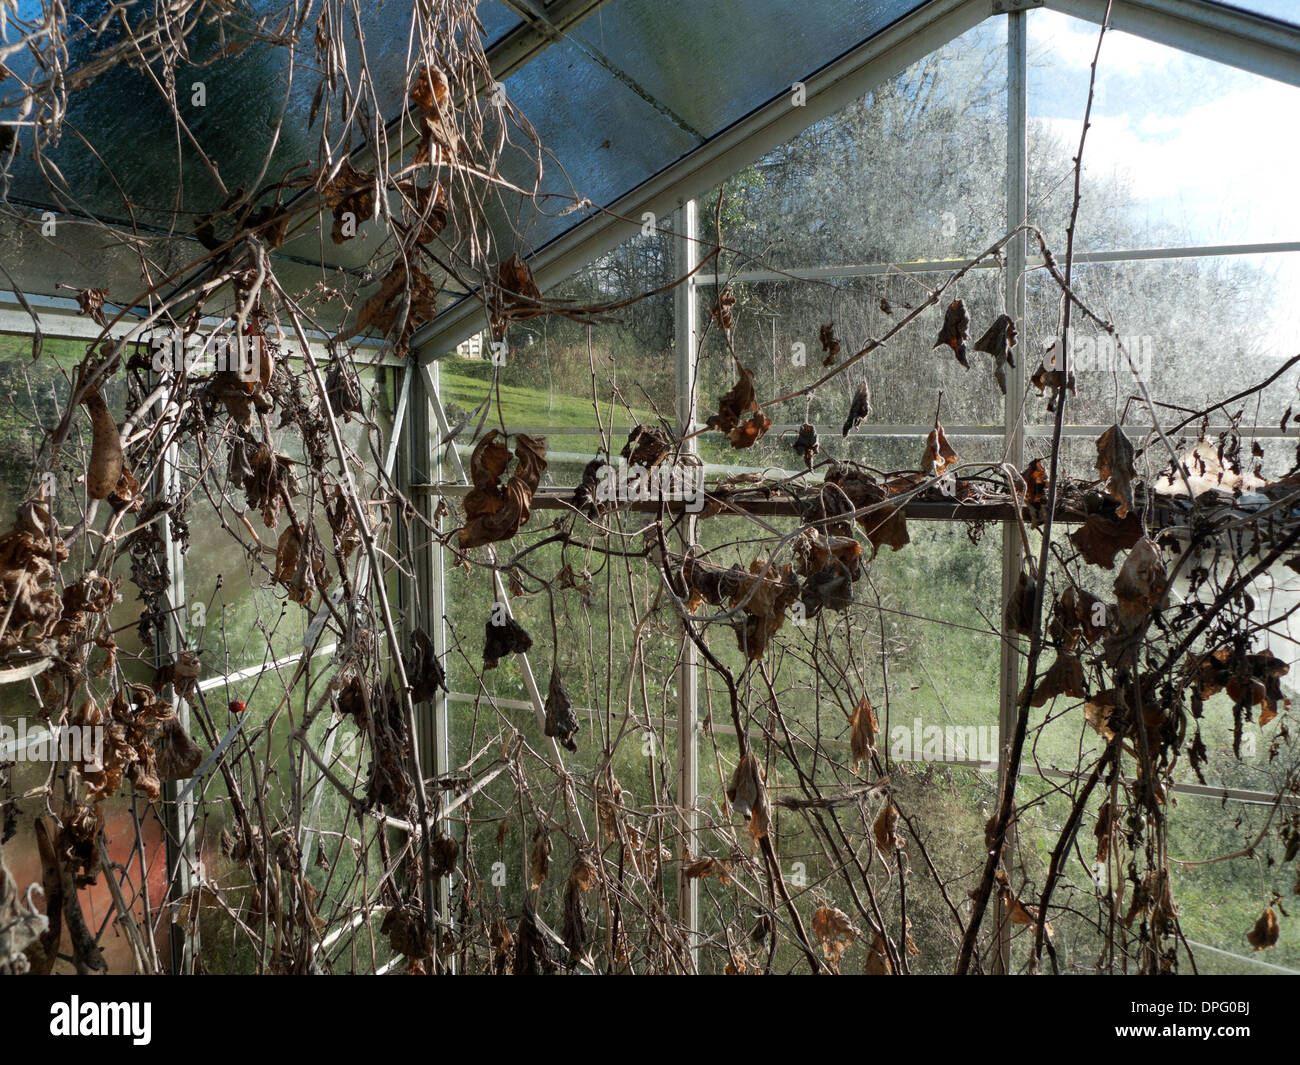 Greenhouse with dead plants in winter garden Carmarthenshire Wales UK KATHY DEWITT - Stock Image